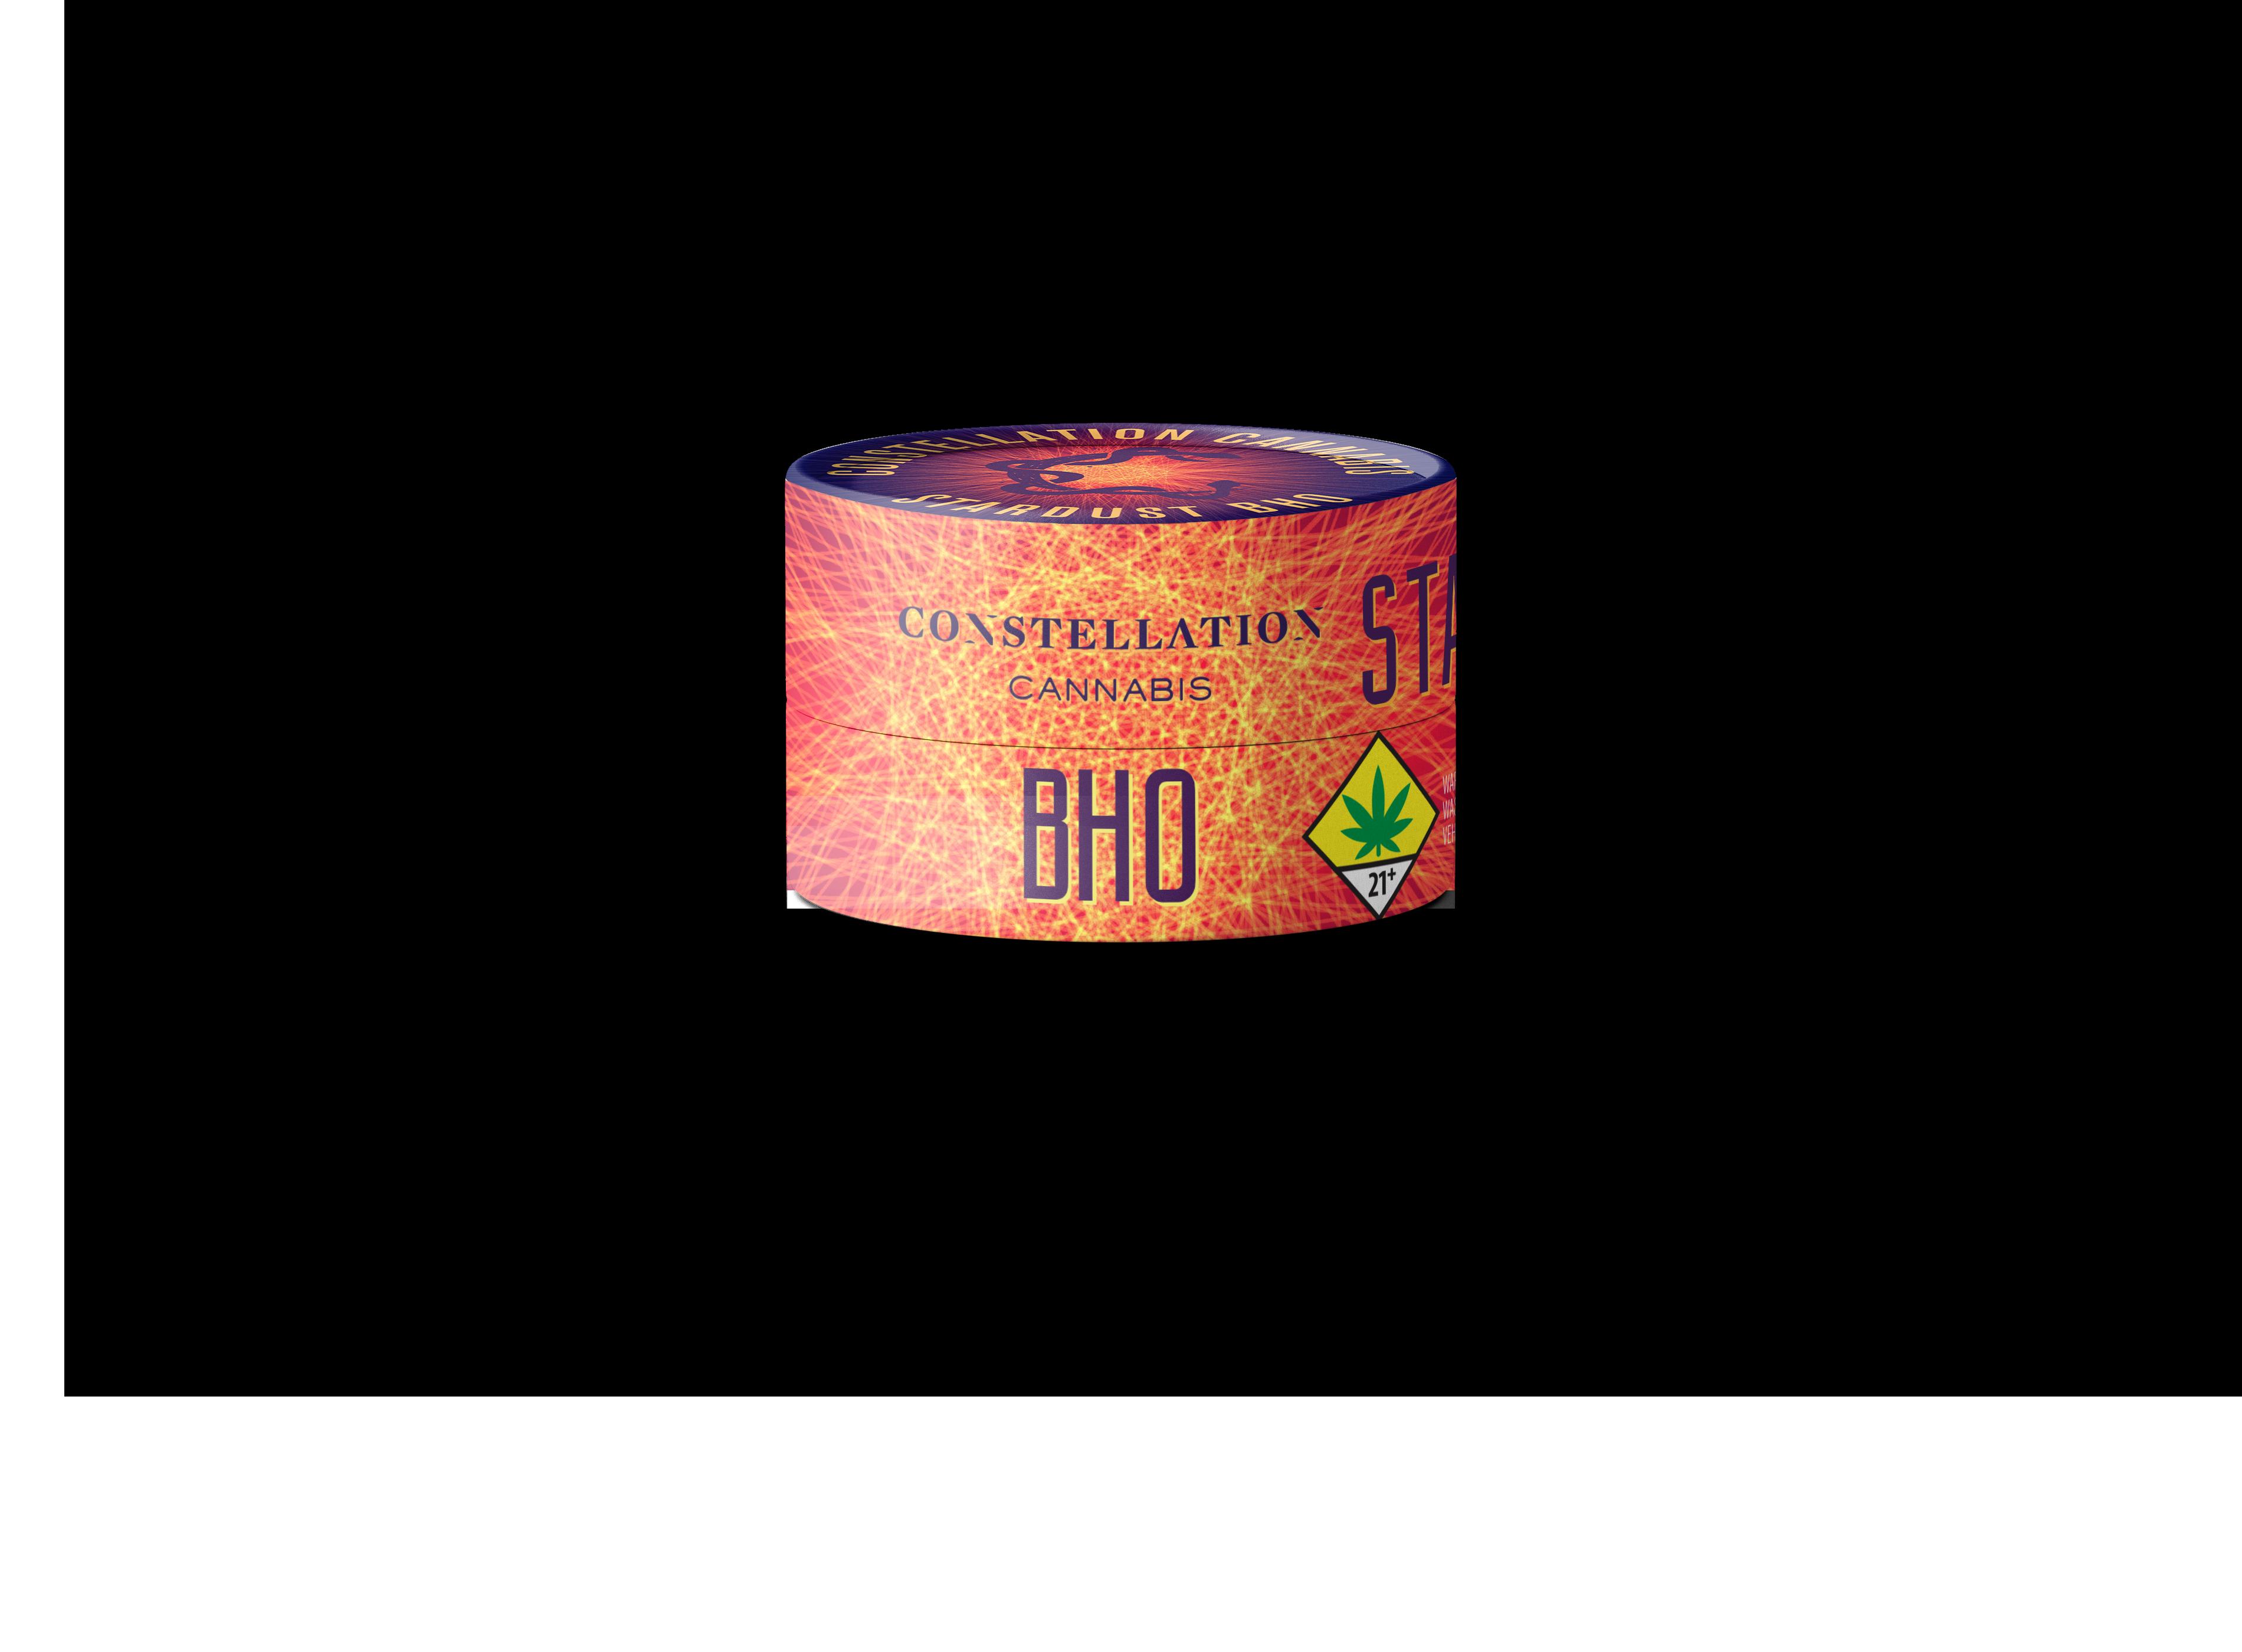 Orange Sherbert Space Dust Wax Product Image